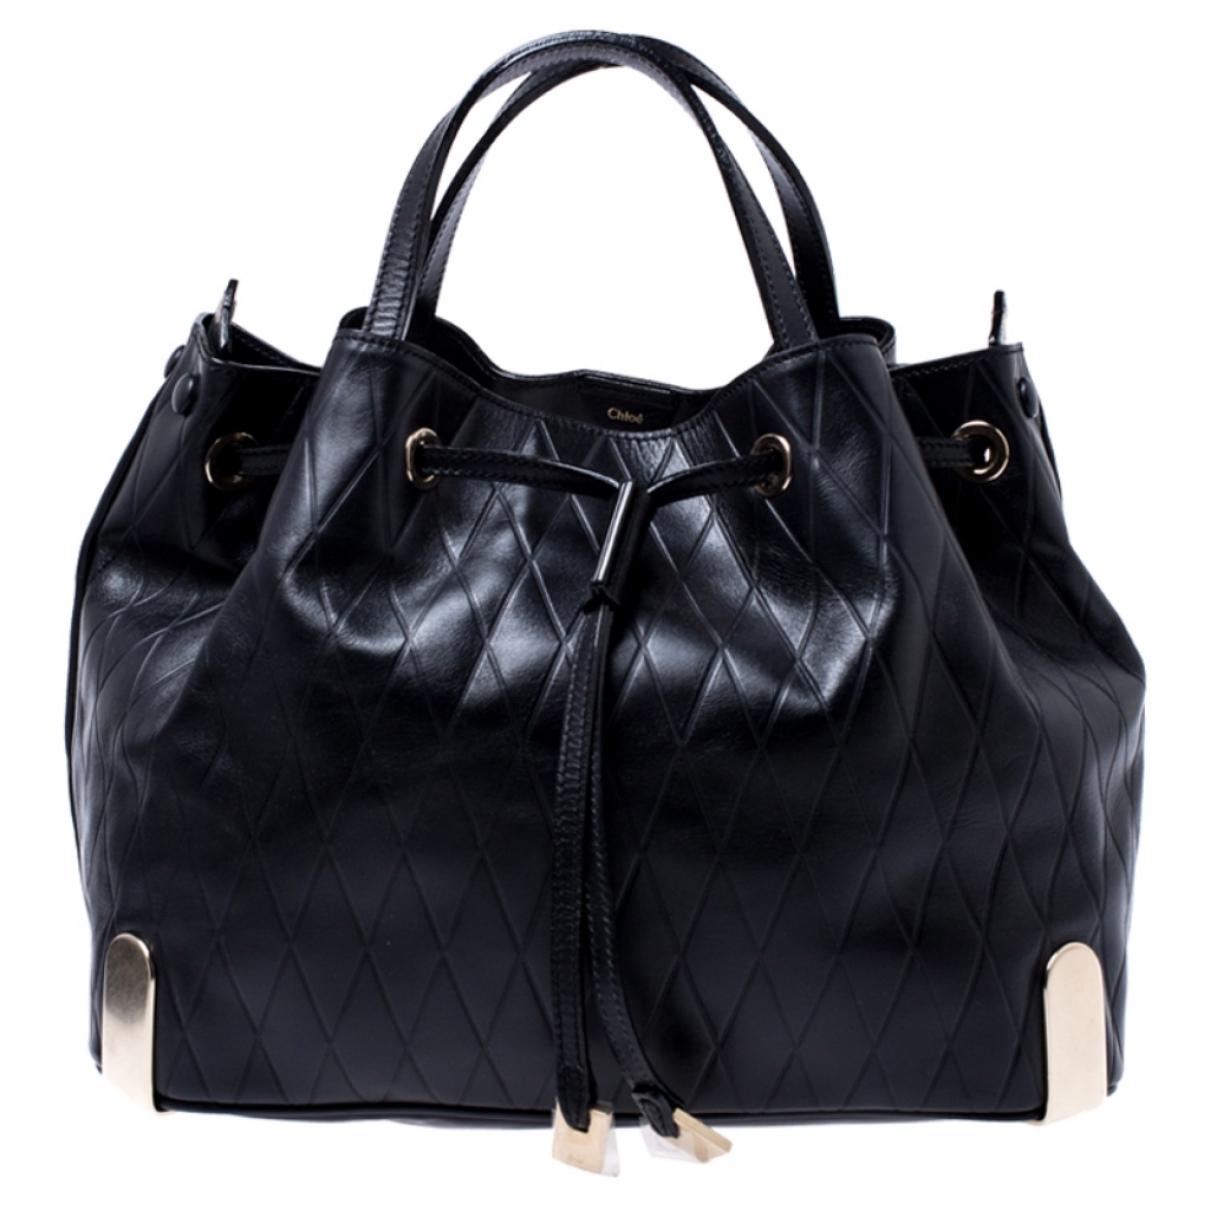 Chloé N Black Leather handbag for Women N